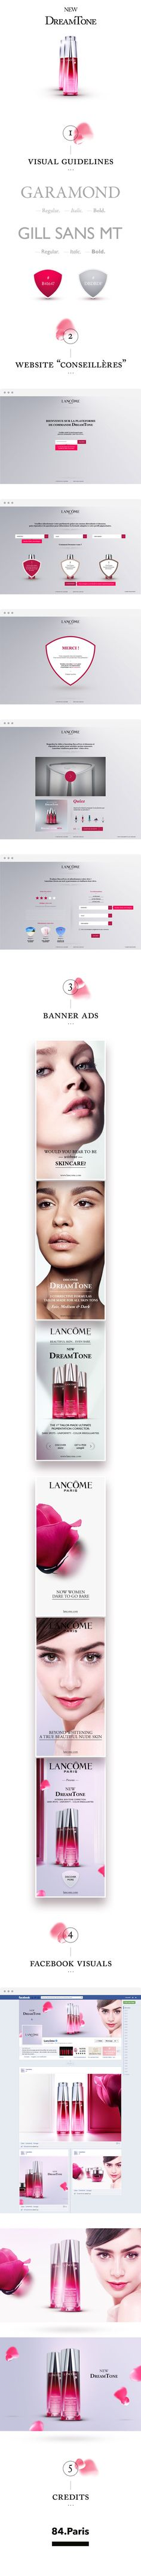 "© Lancôme Paris - ""DreamTone"" | international digital campaign - 2013.| Art Direction & Web Design |"